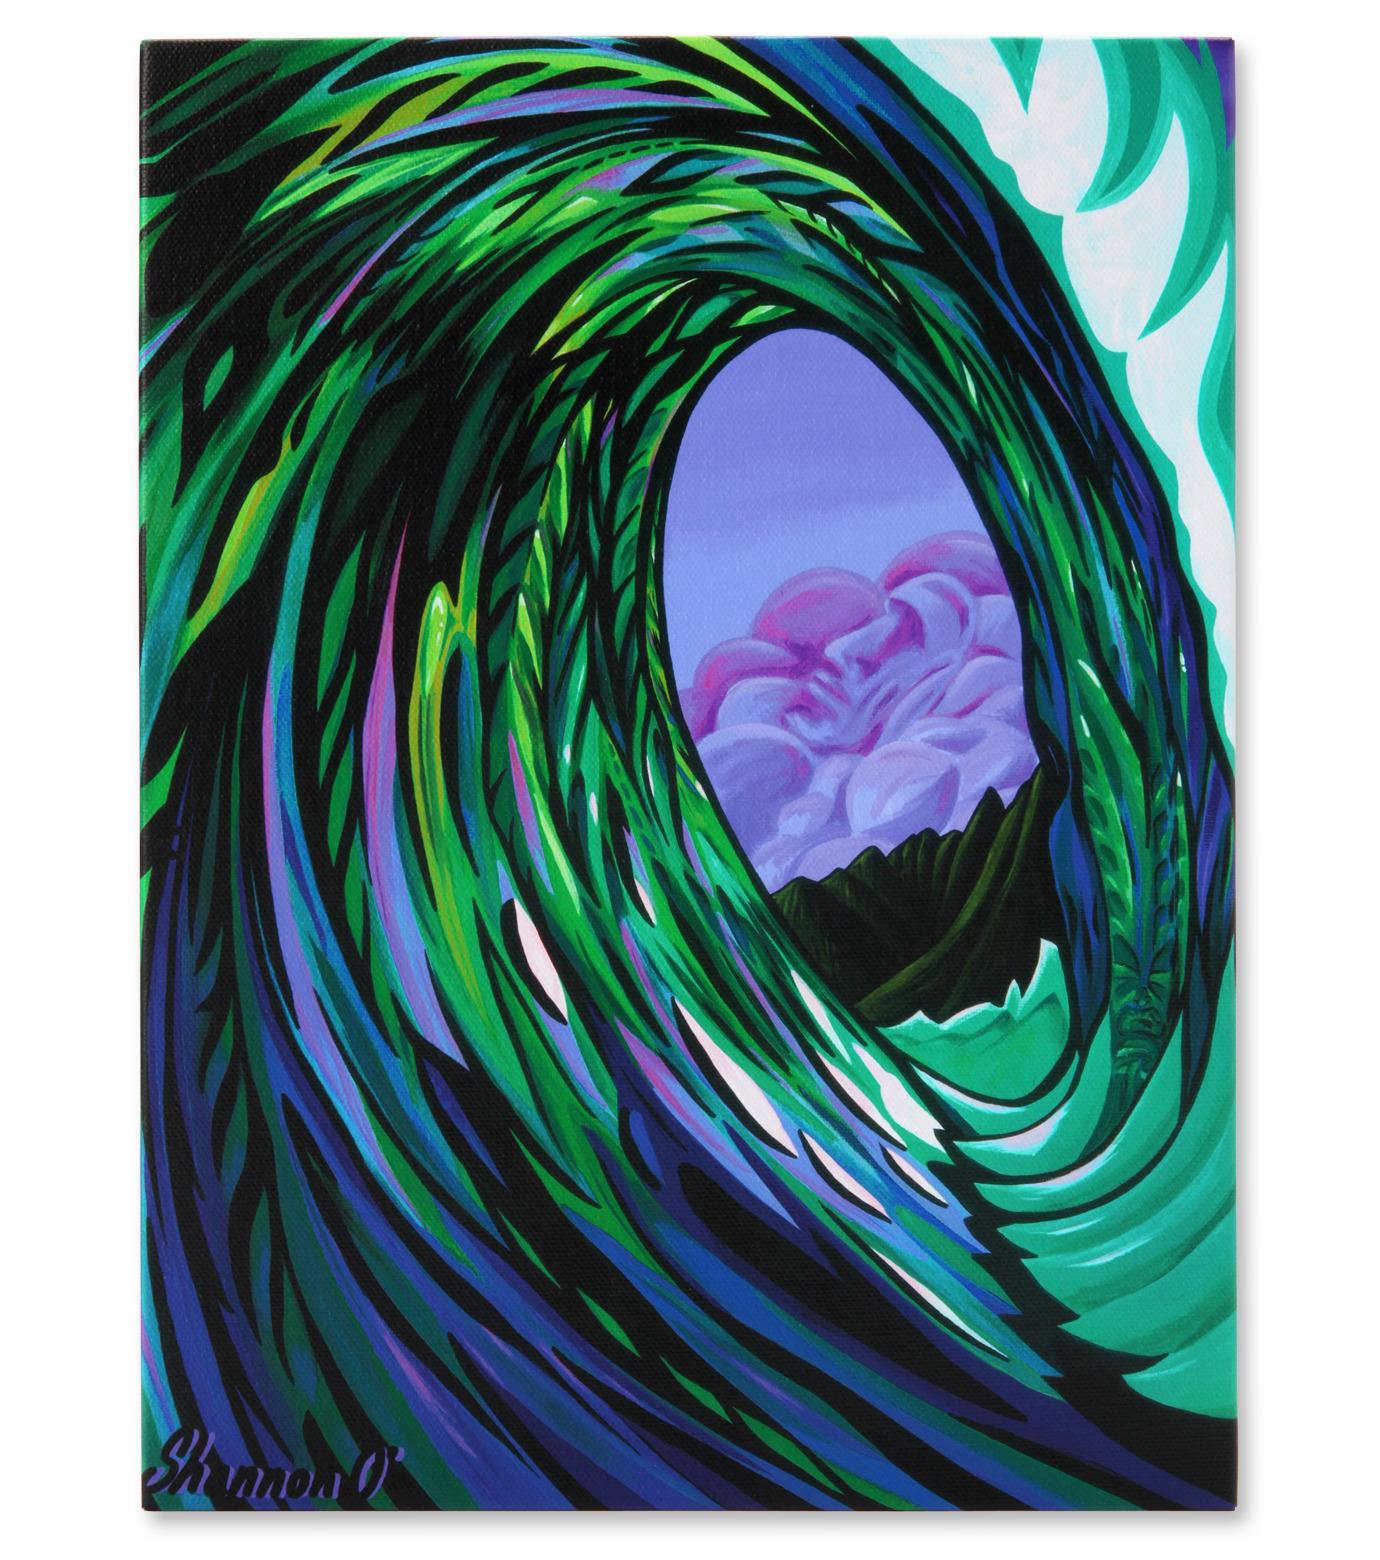 9th Wave Gallery(9th ウェイブ ギャラリー)のTiki Tube M-NONE-S-G-Tube-0 拡大詳細画像1